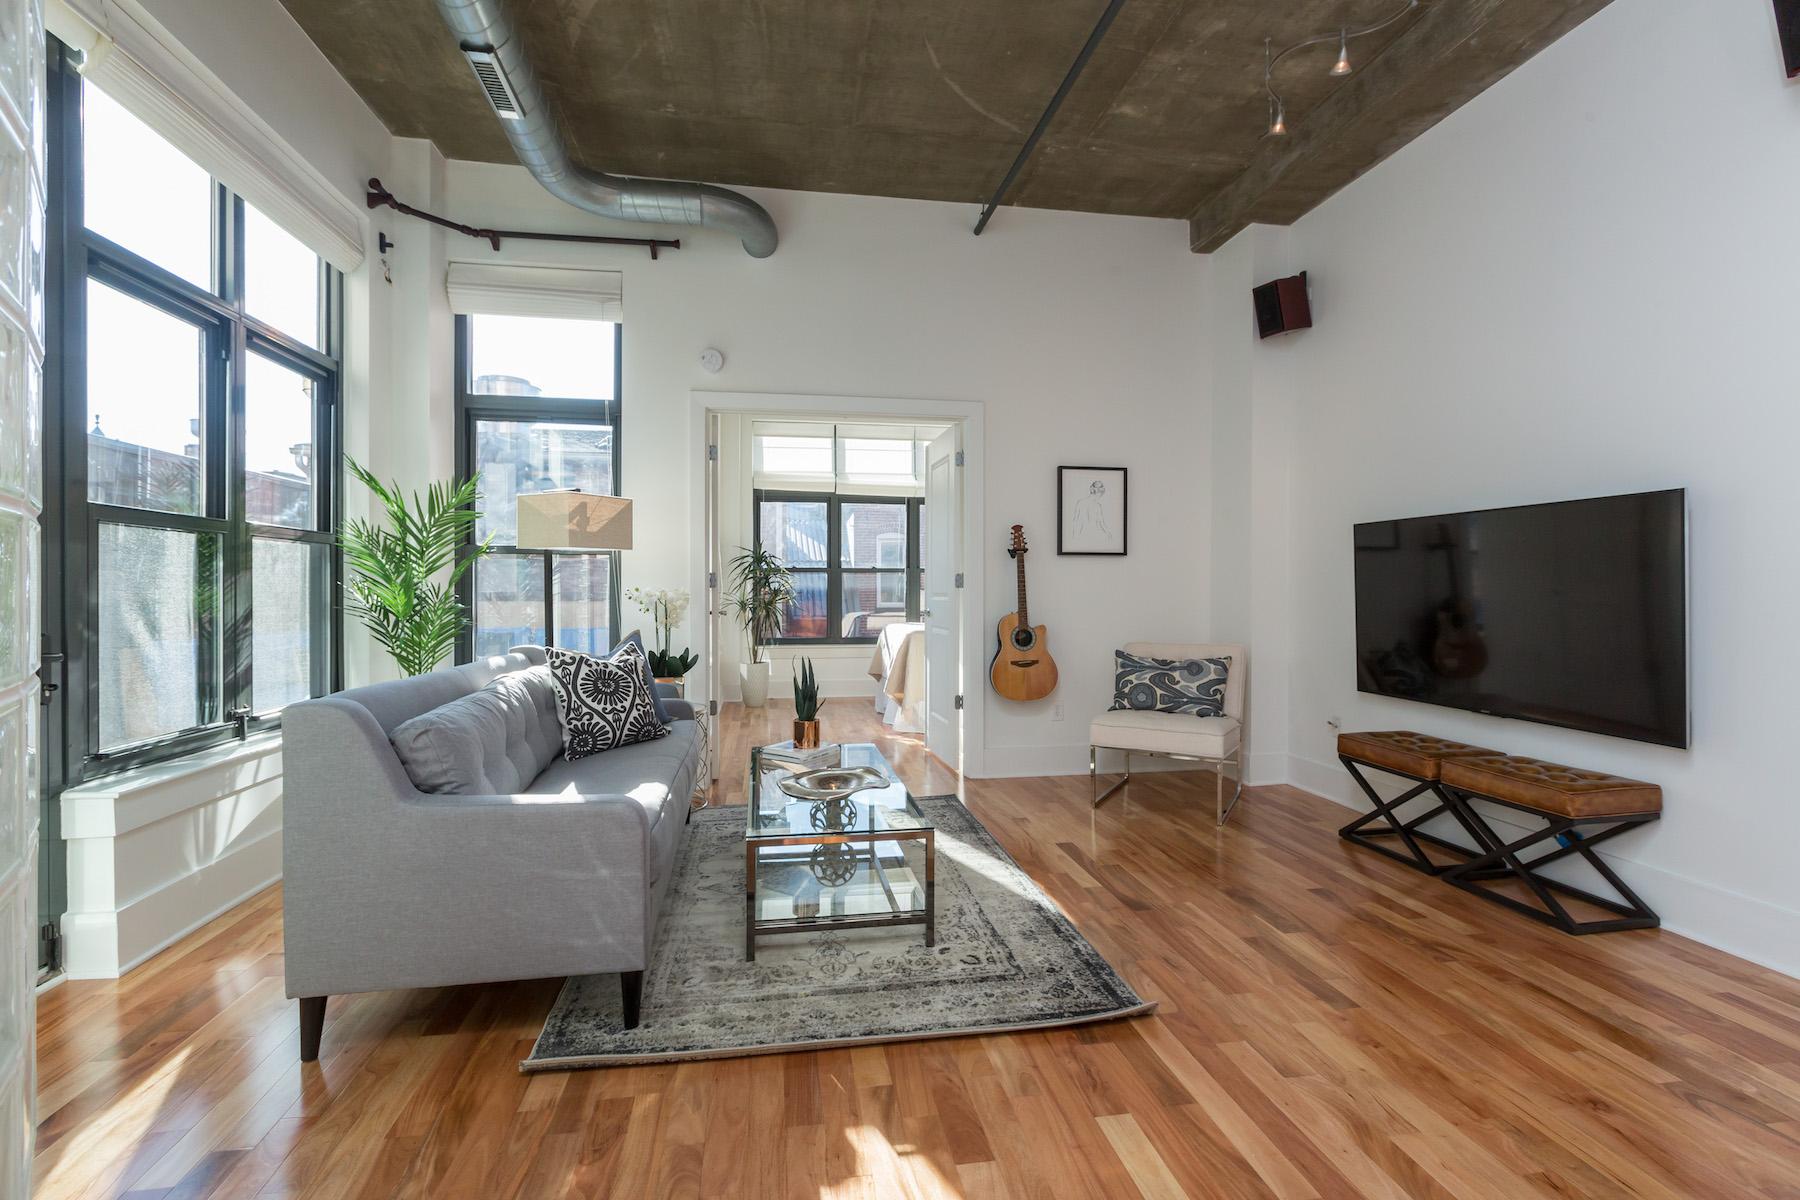 sales property at 2328 Champlain Street Nw 306, Washington